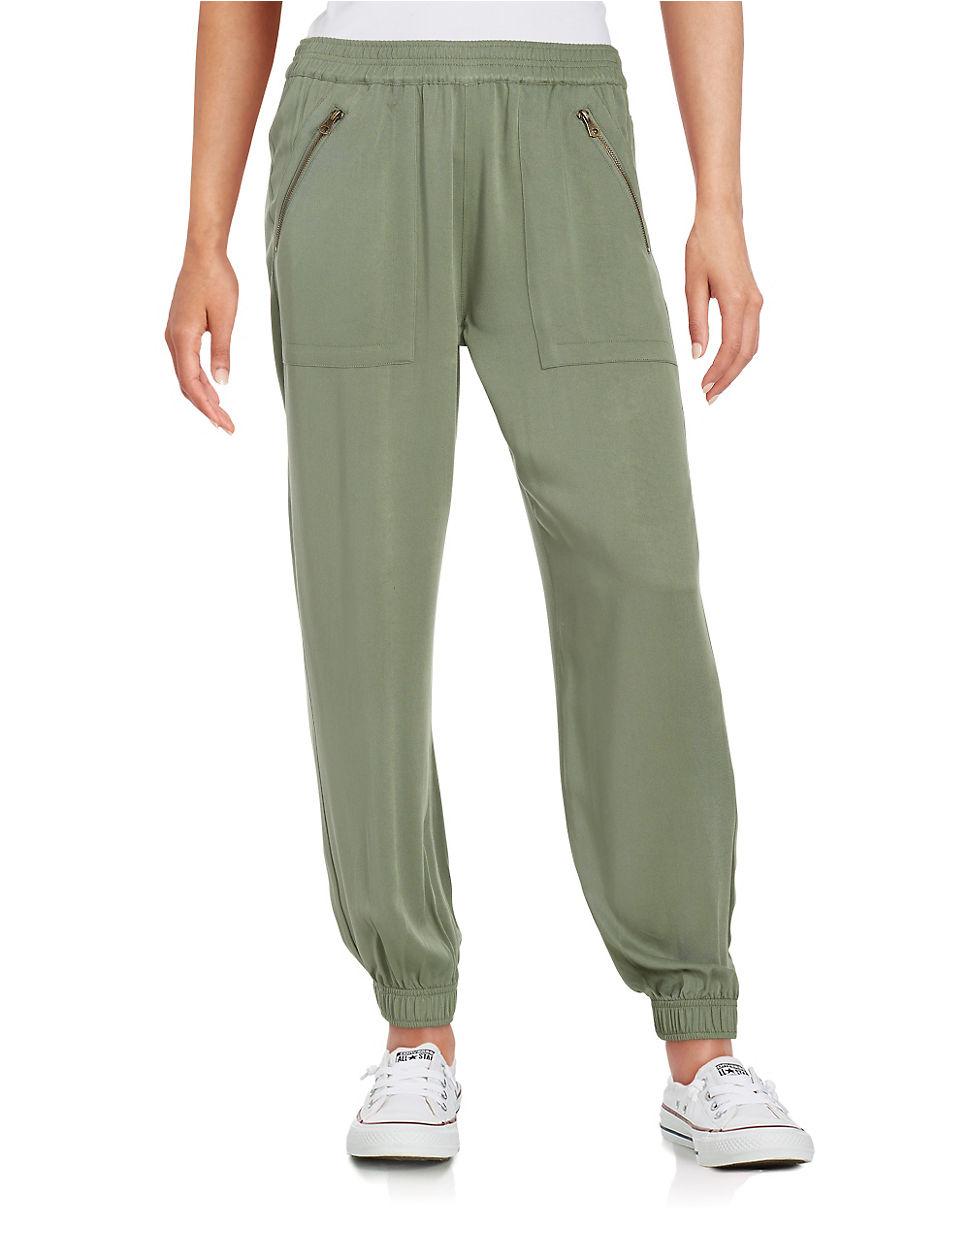 Creative  Pants Sweat Pants Element Claire Jogging Pants Women Shaking Green